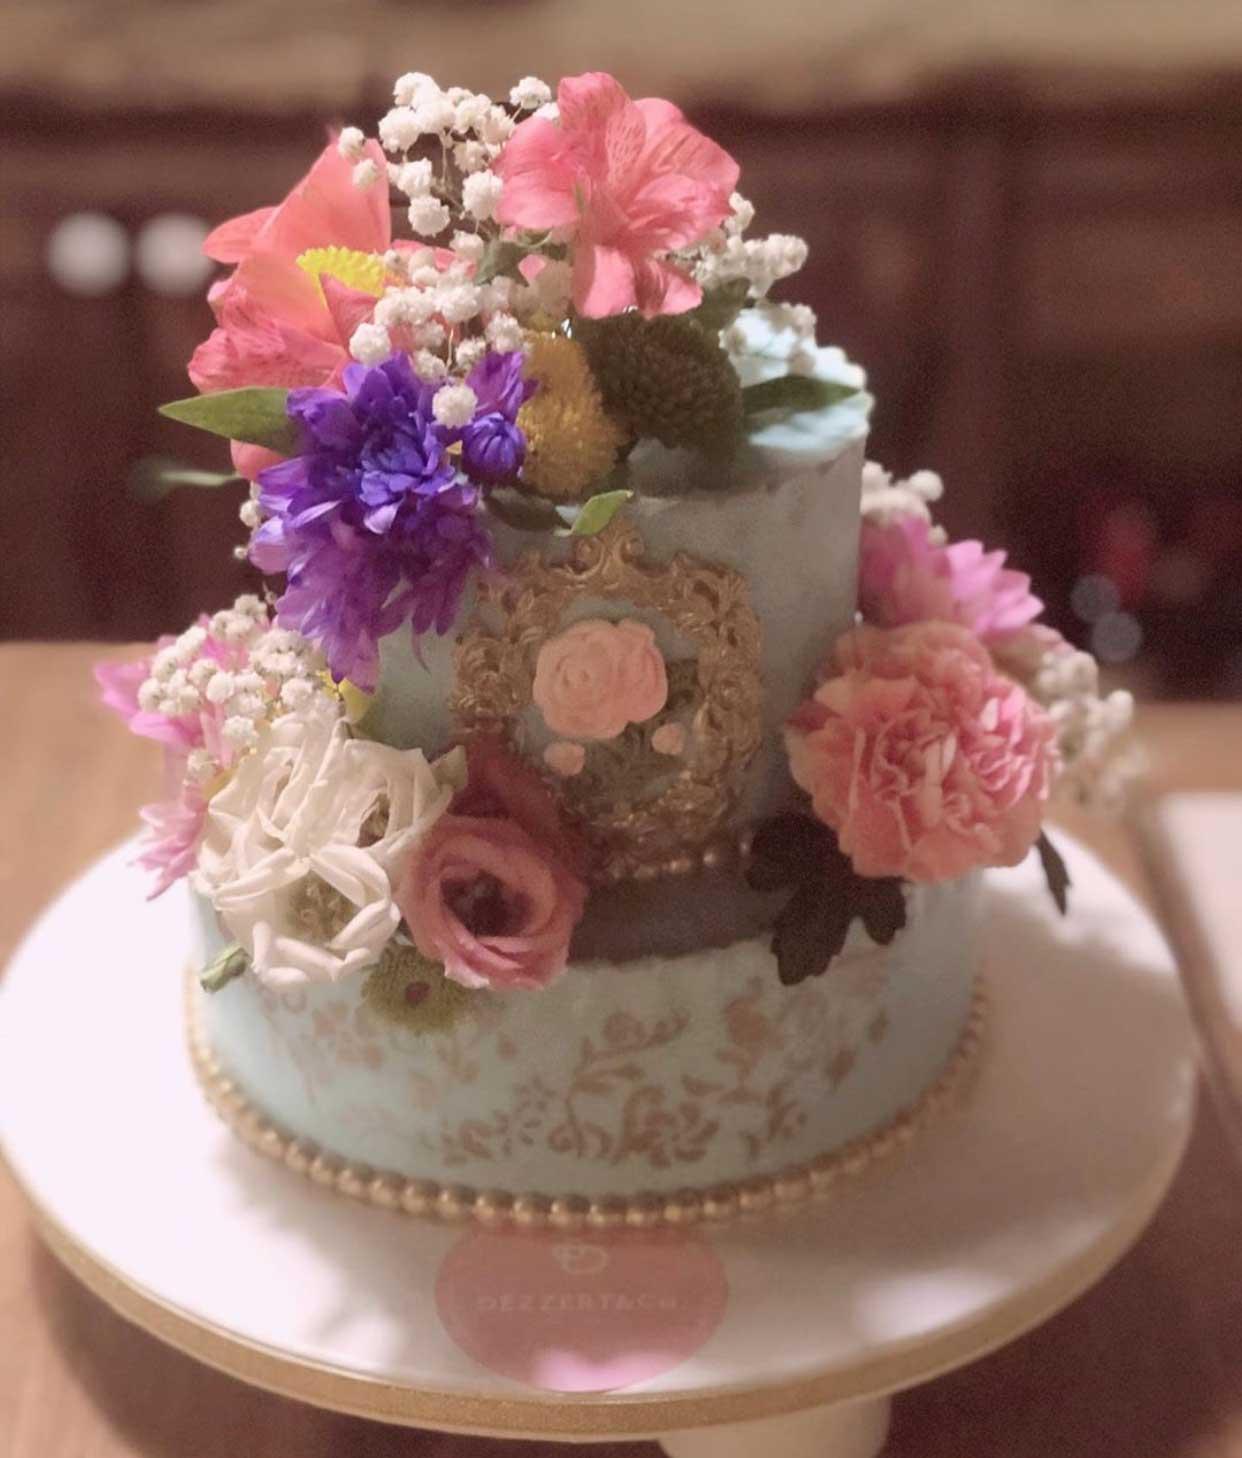 Njegomir torte Dezzert & Co